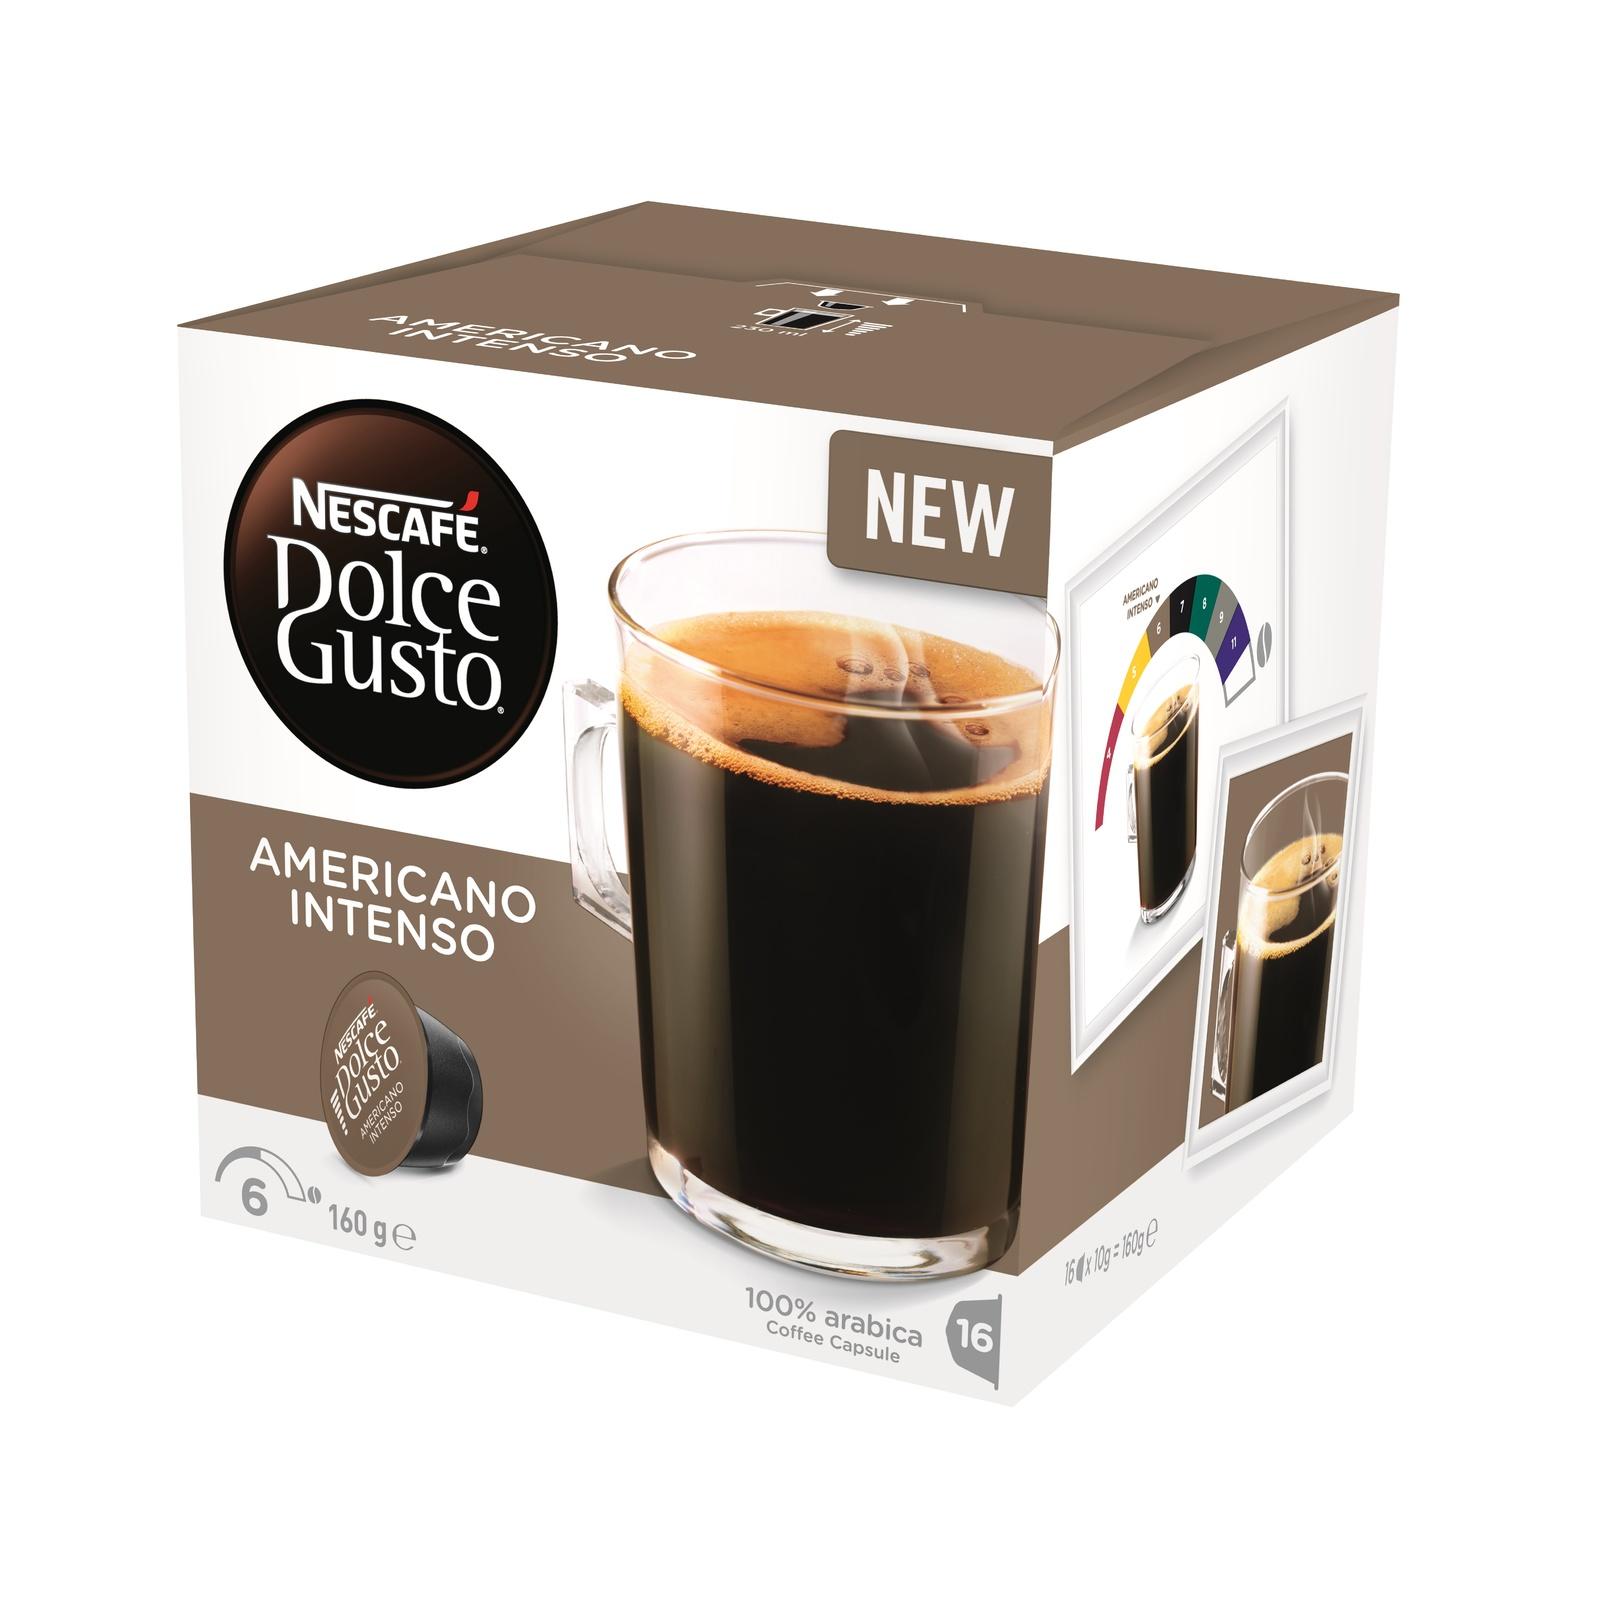 Nescafe Dolce Gusto (Americano Intenso, 16pk) image